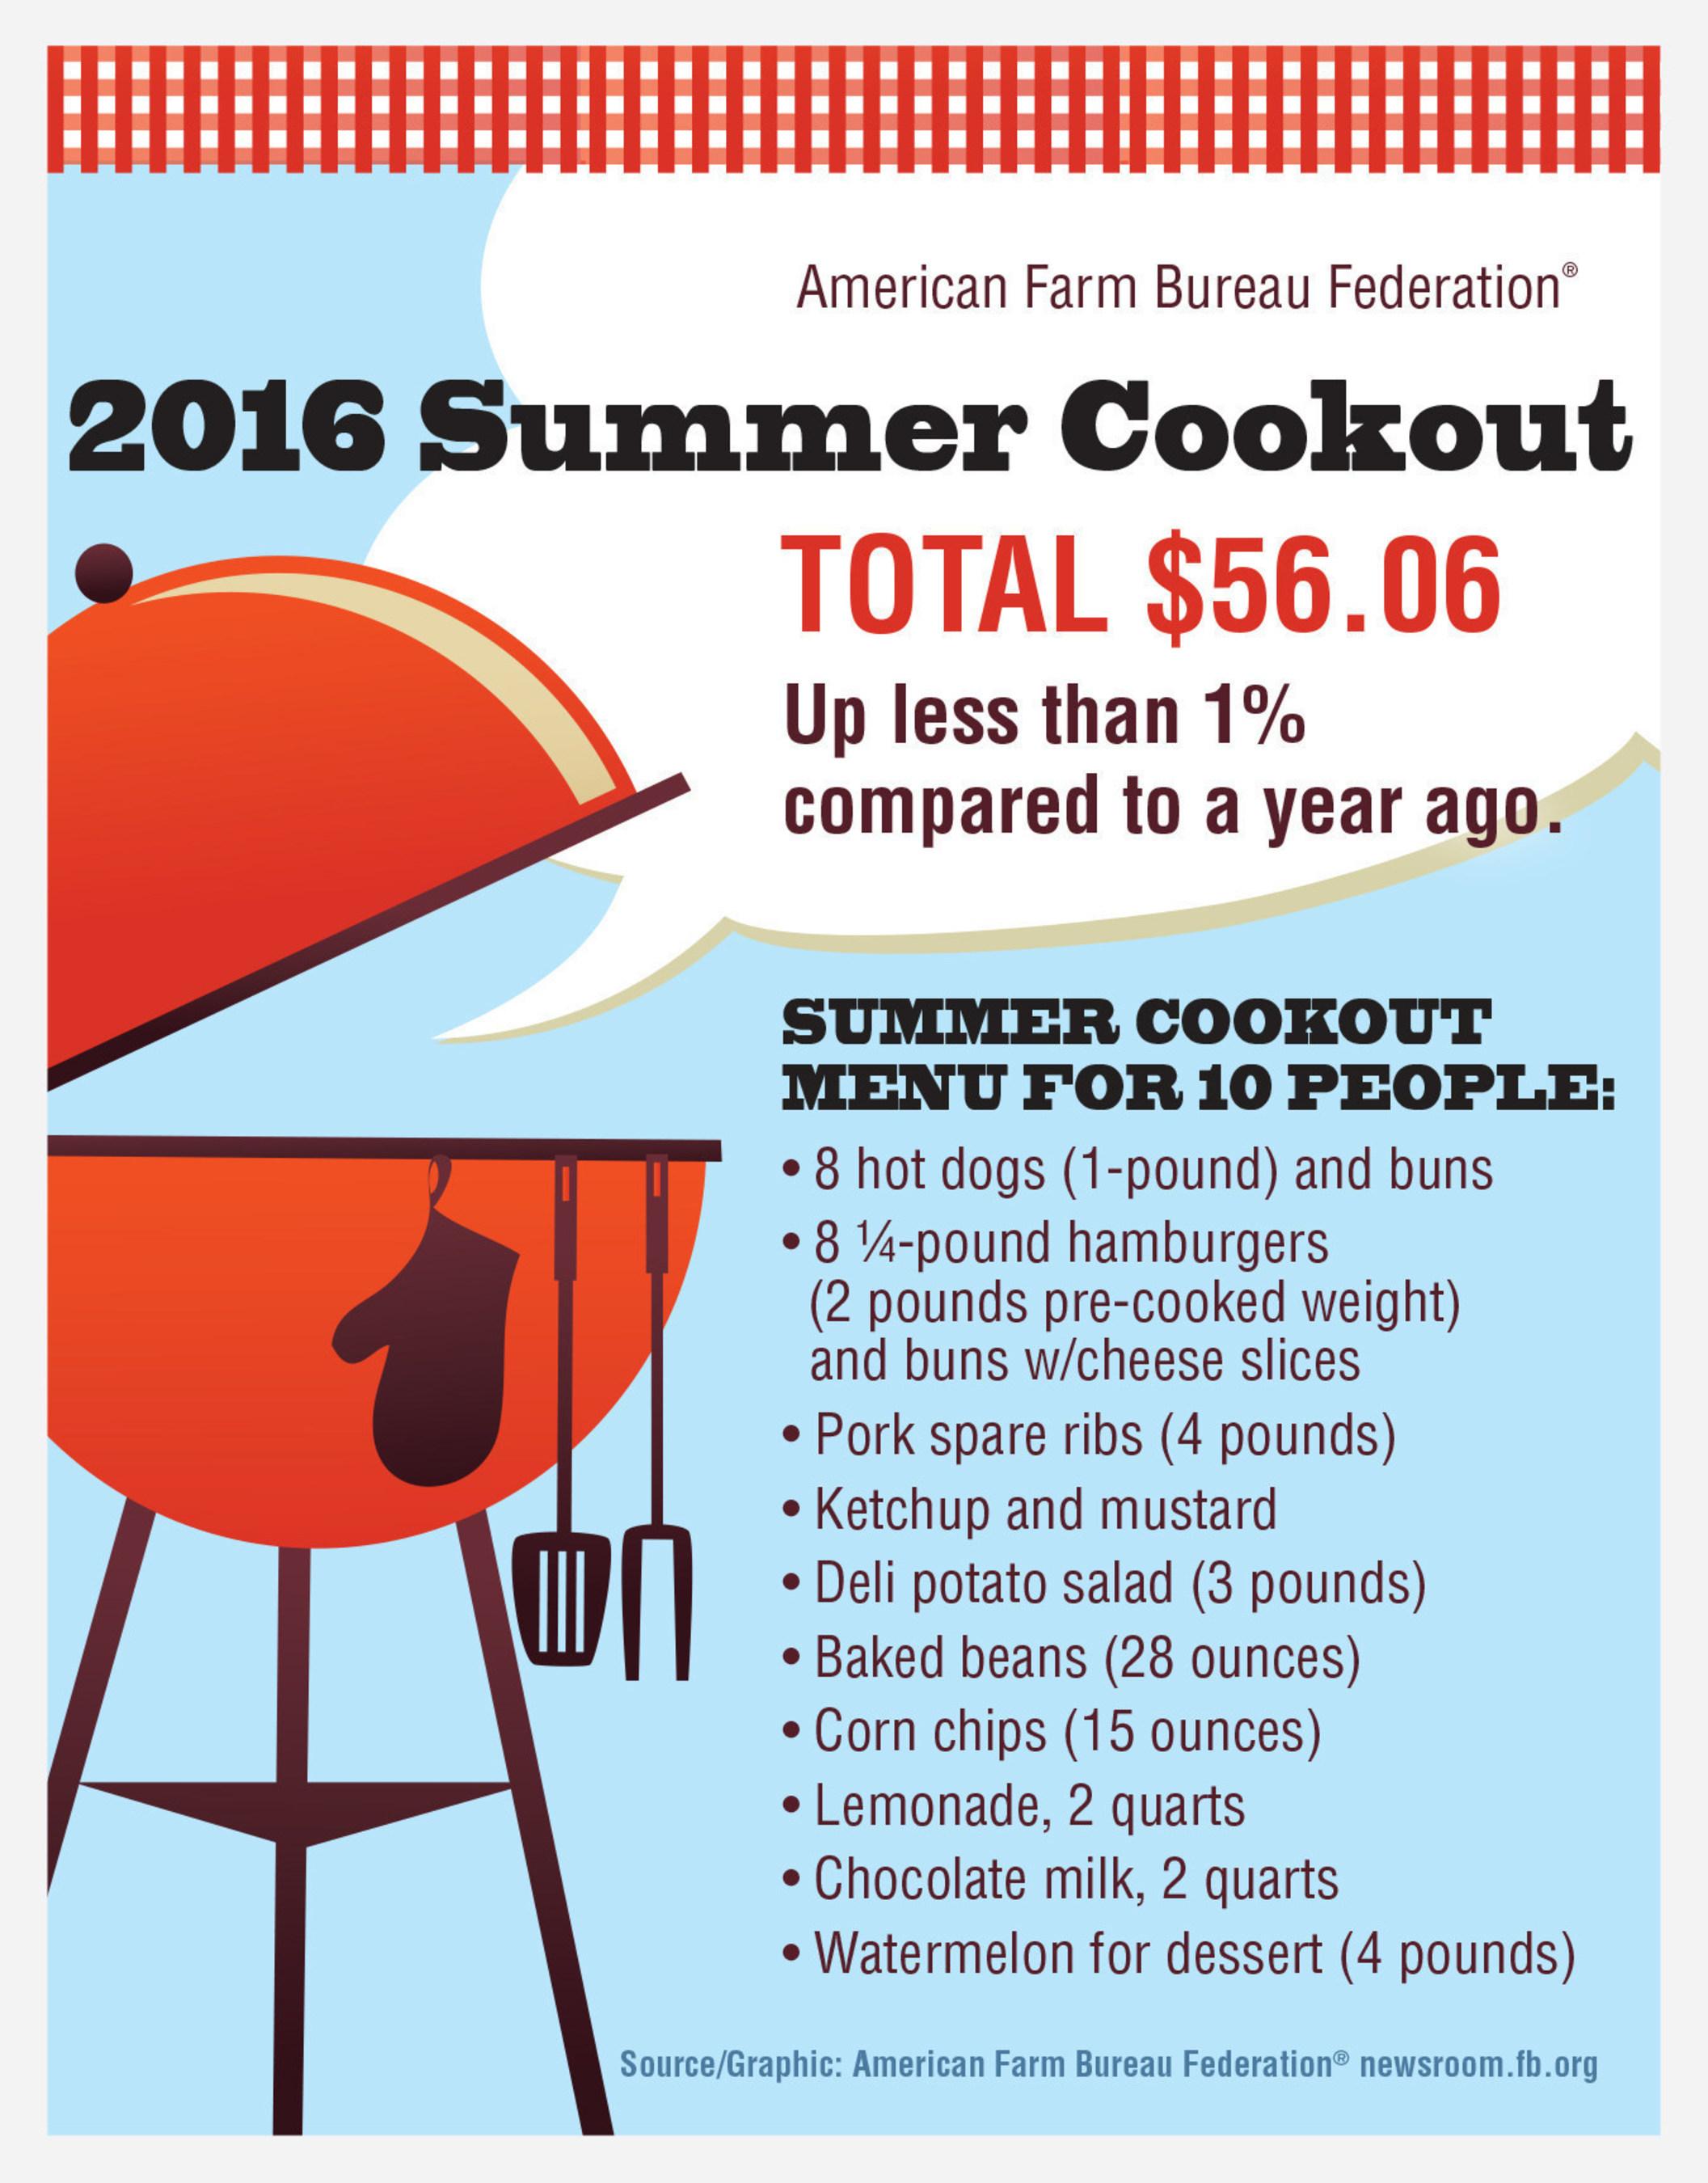 2016 Summer Cookout Marketbasket Survey